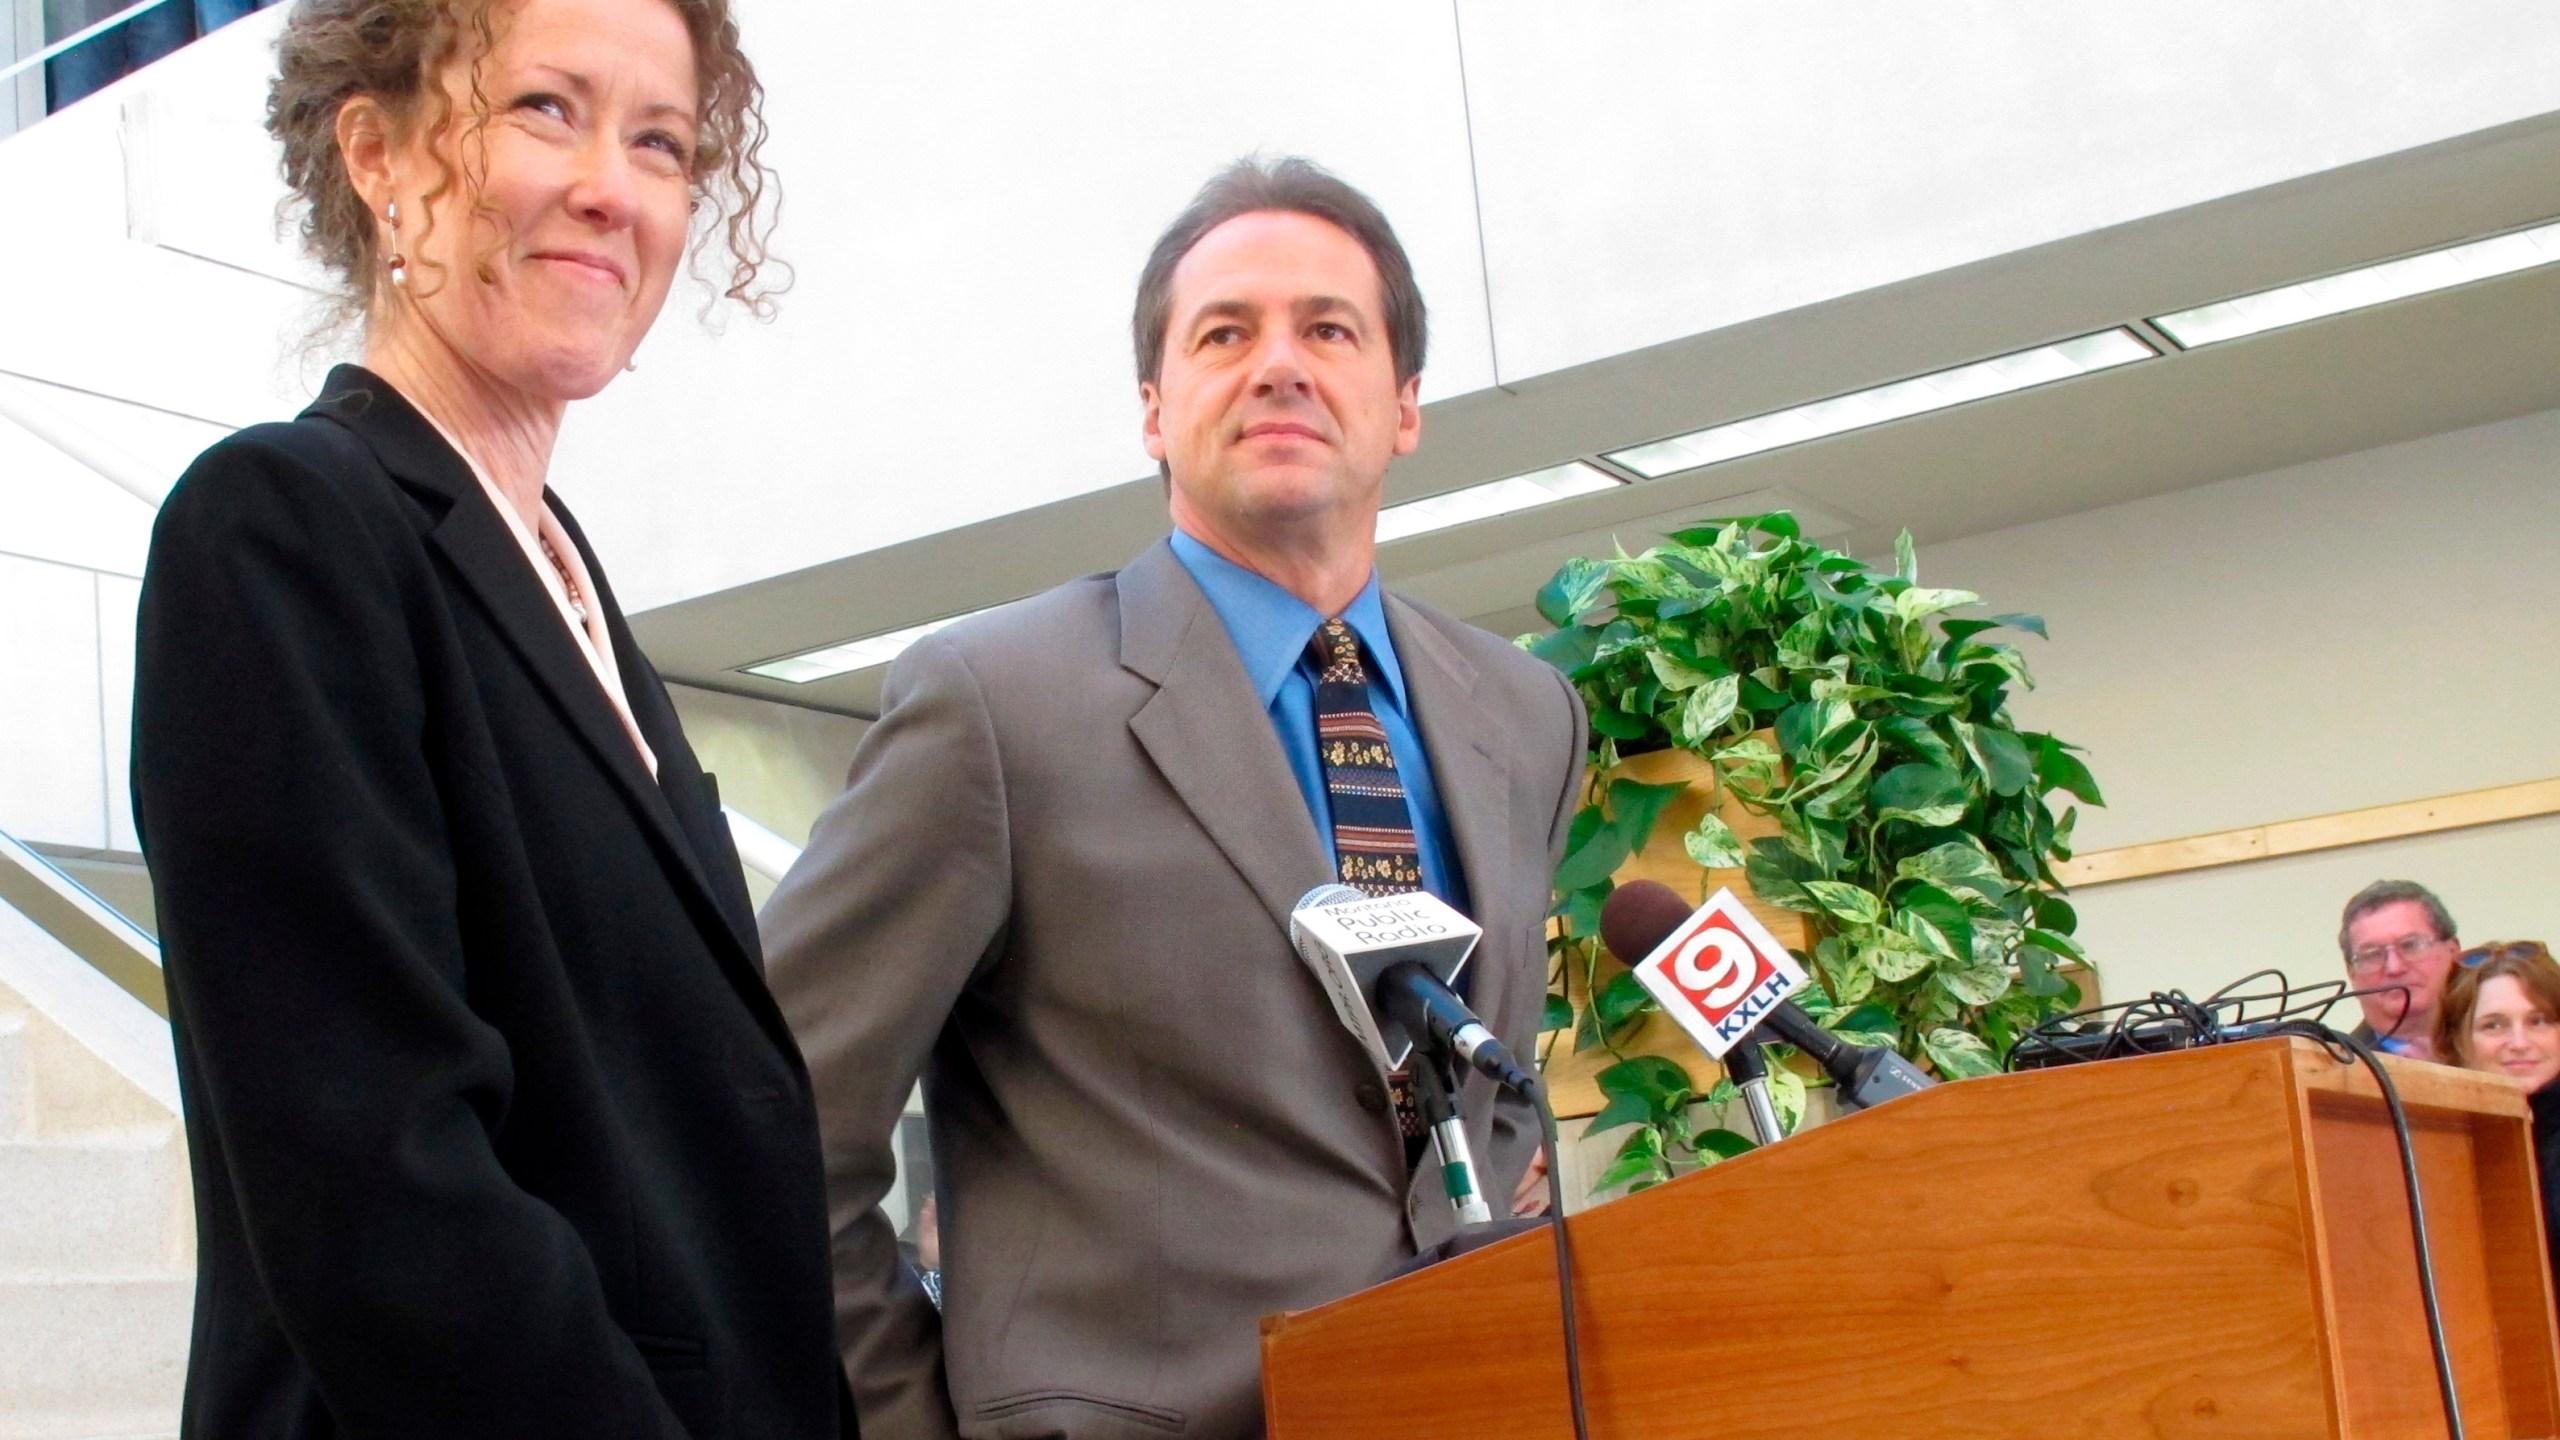 Steve Bullock, Tracy Stone-Manning